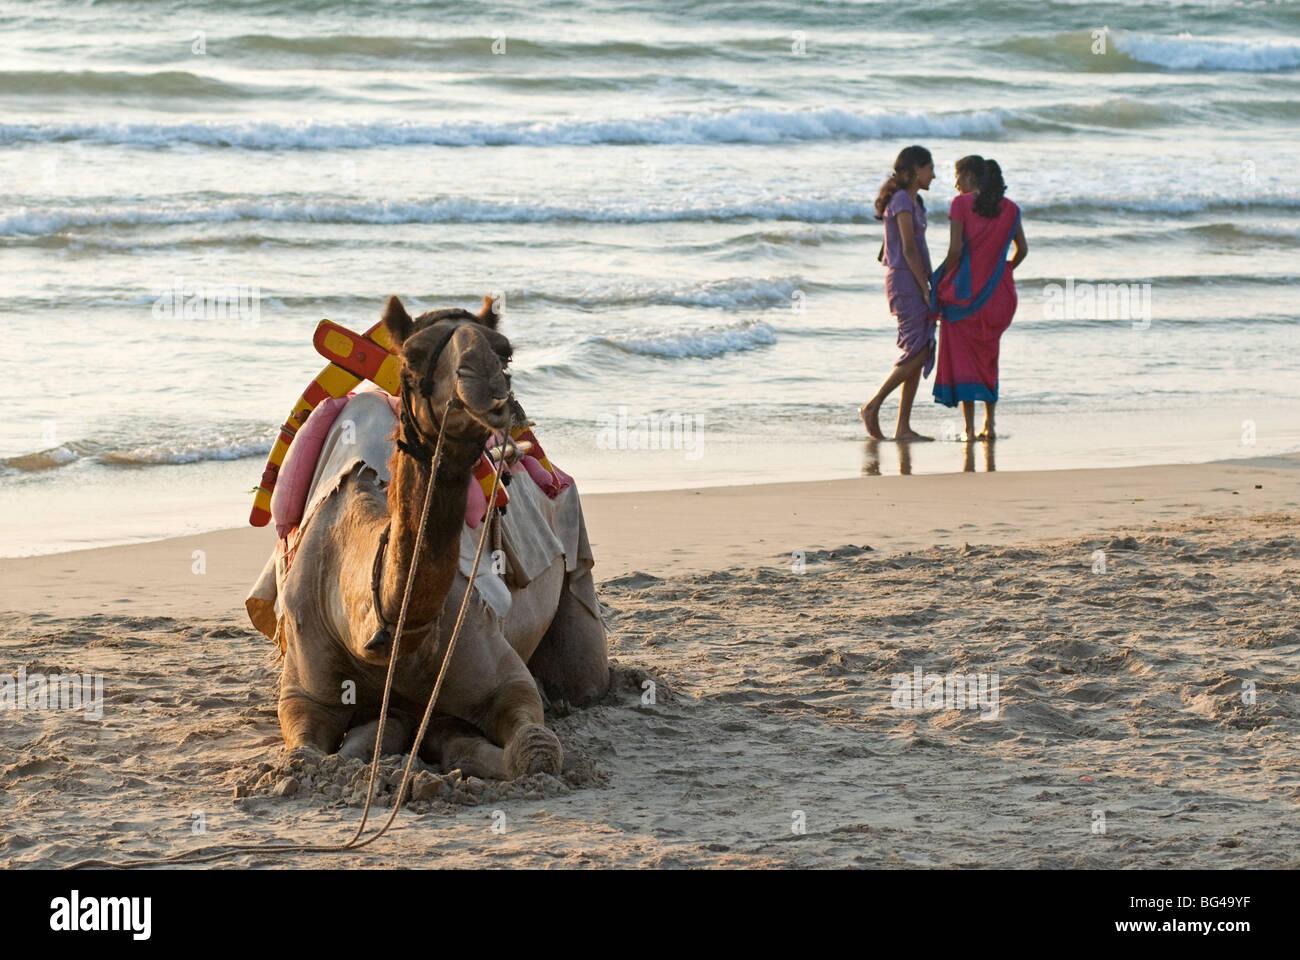 Two girls on beach at dusk, camel waiting, Ganpatipule, Karnataka, India, Asia - Stock Image